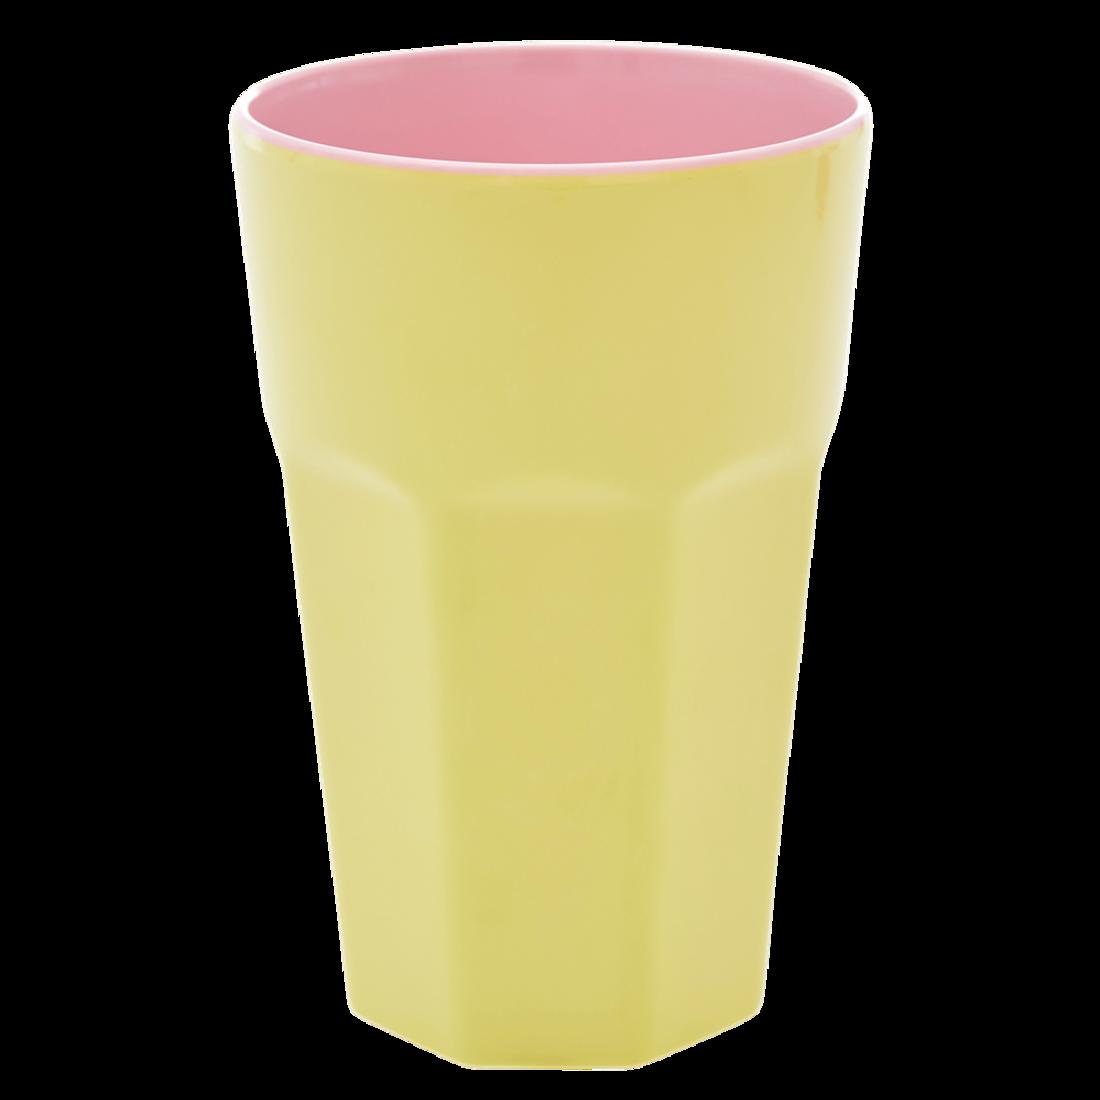 Rice Becher gelb - pink